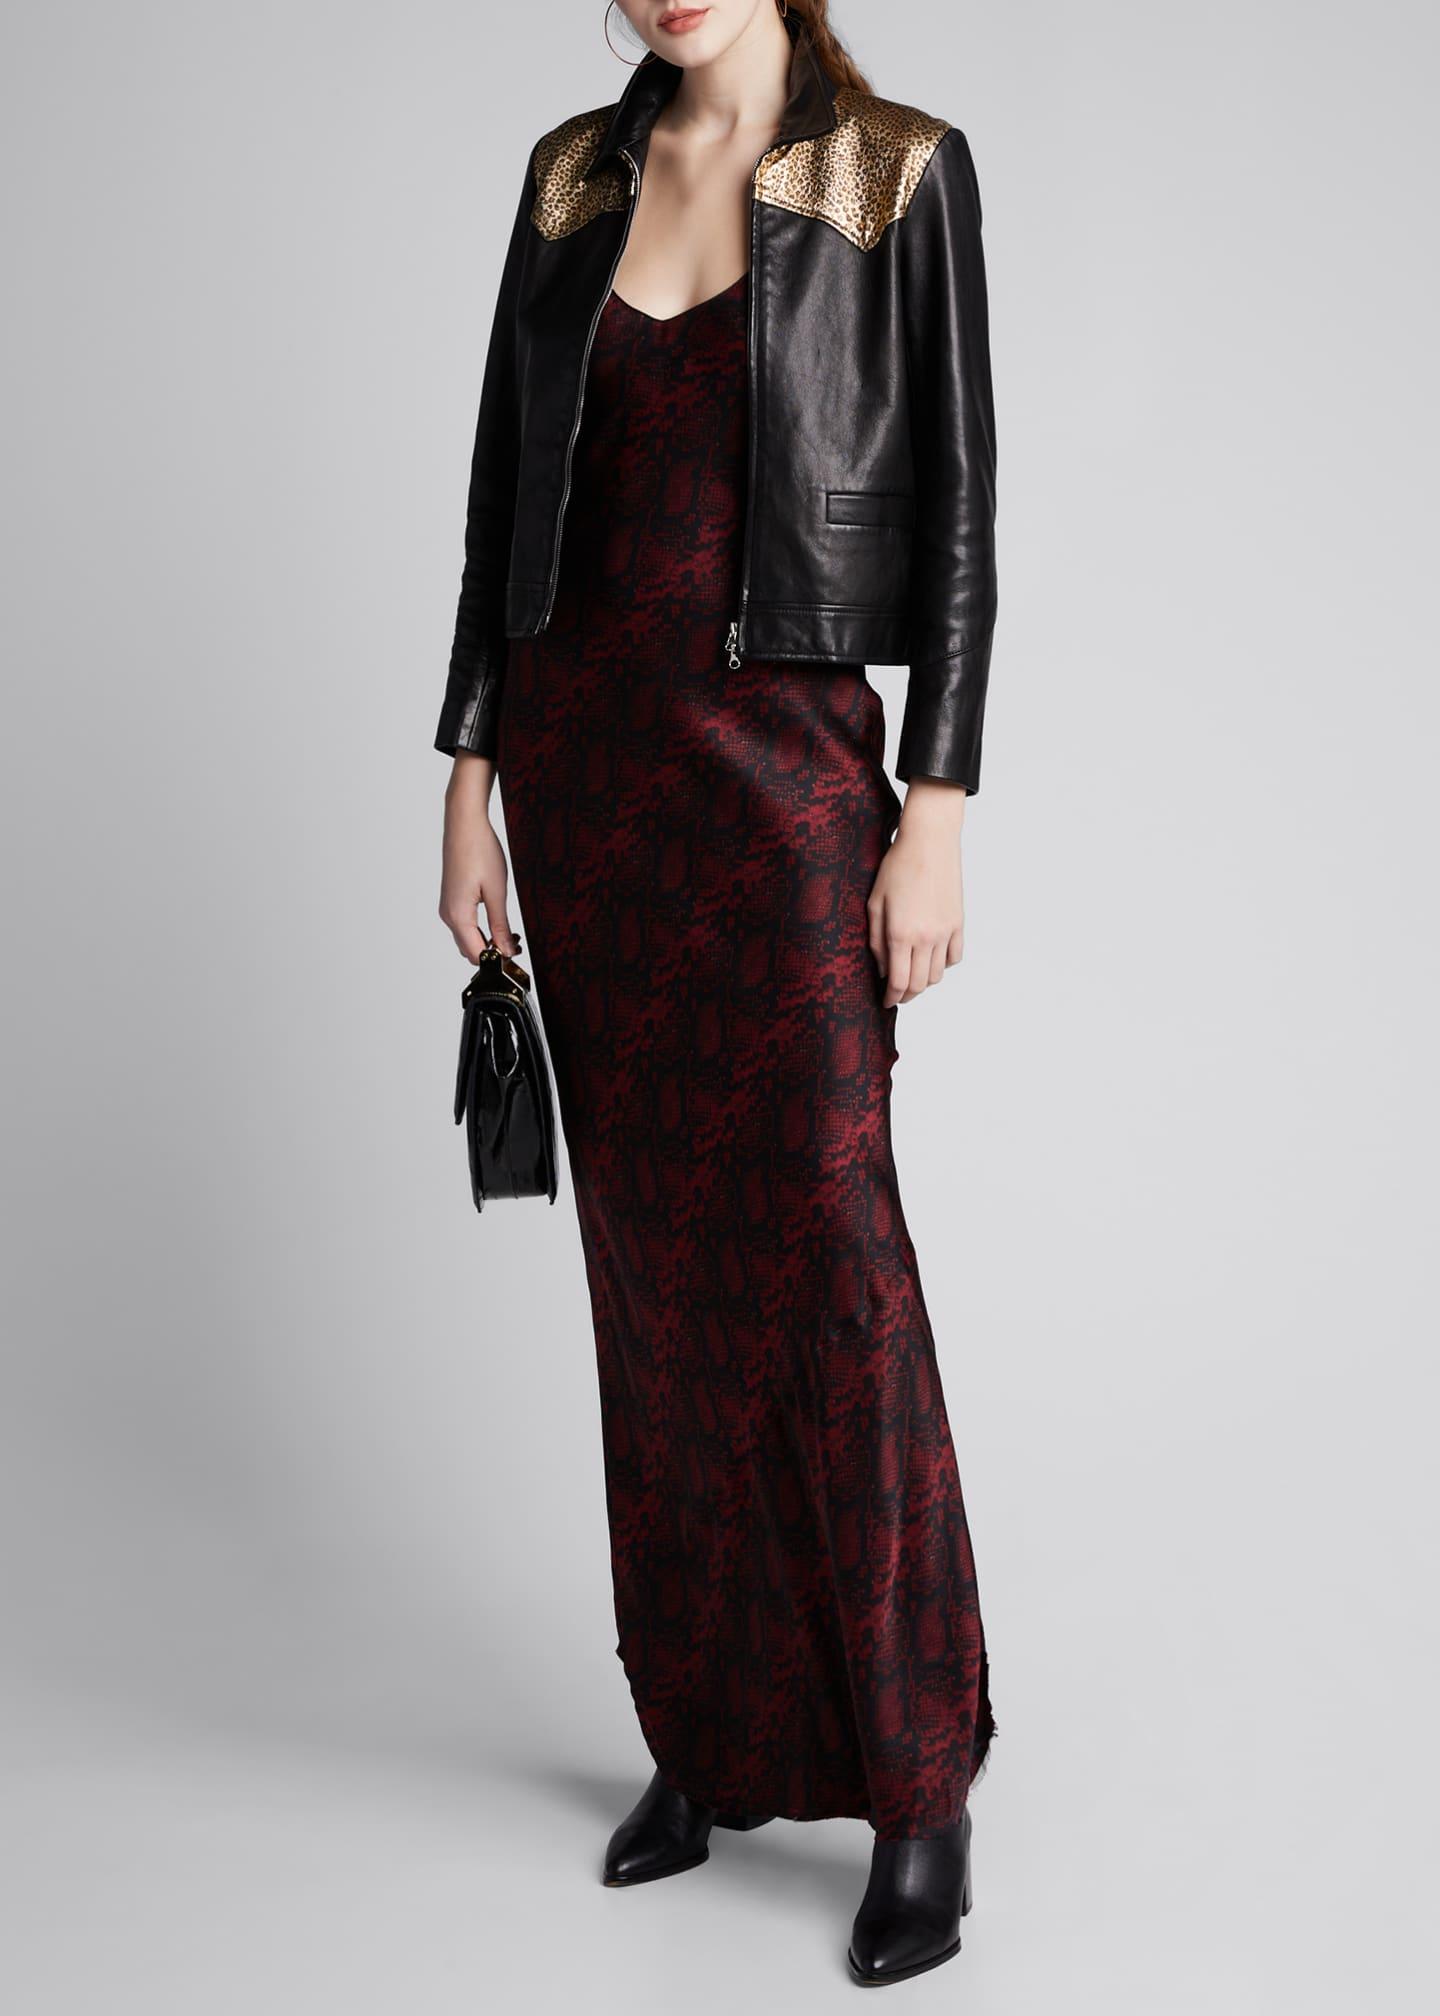 Nili Lotan Snake-Print Silk Slip Gown